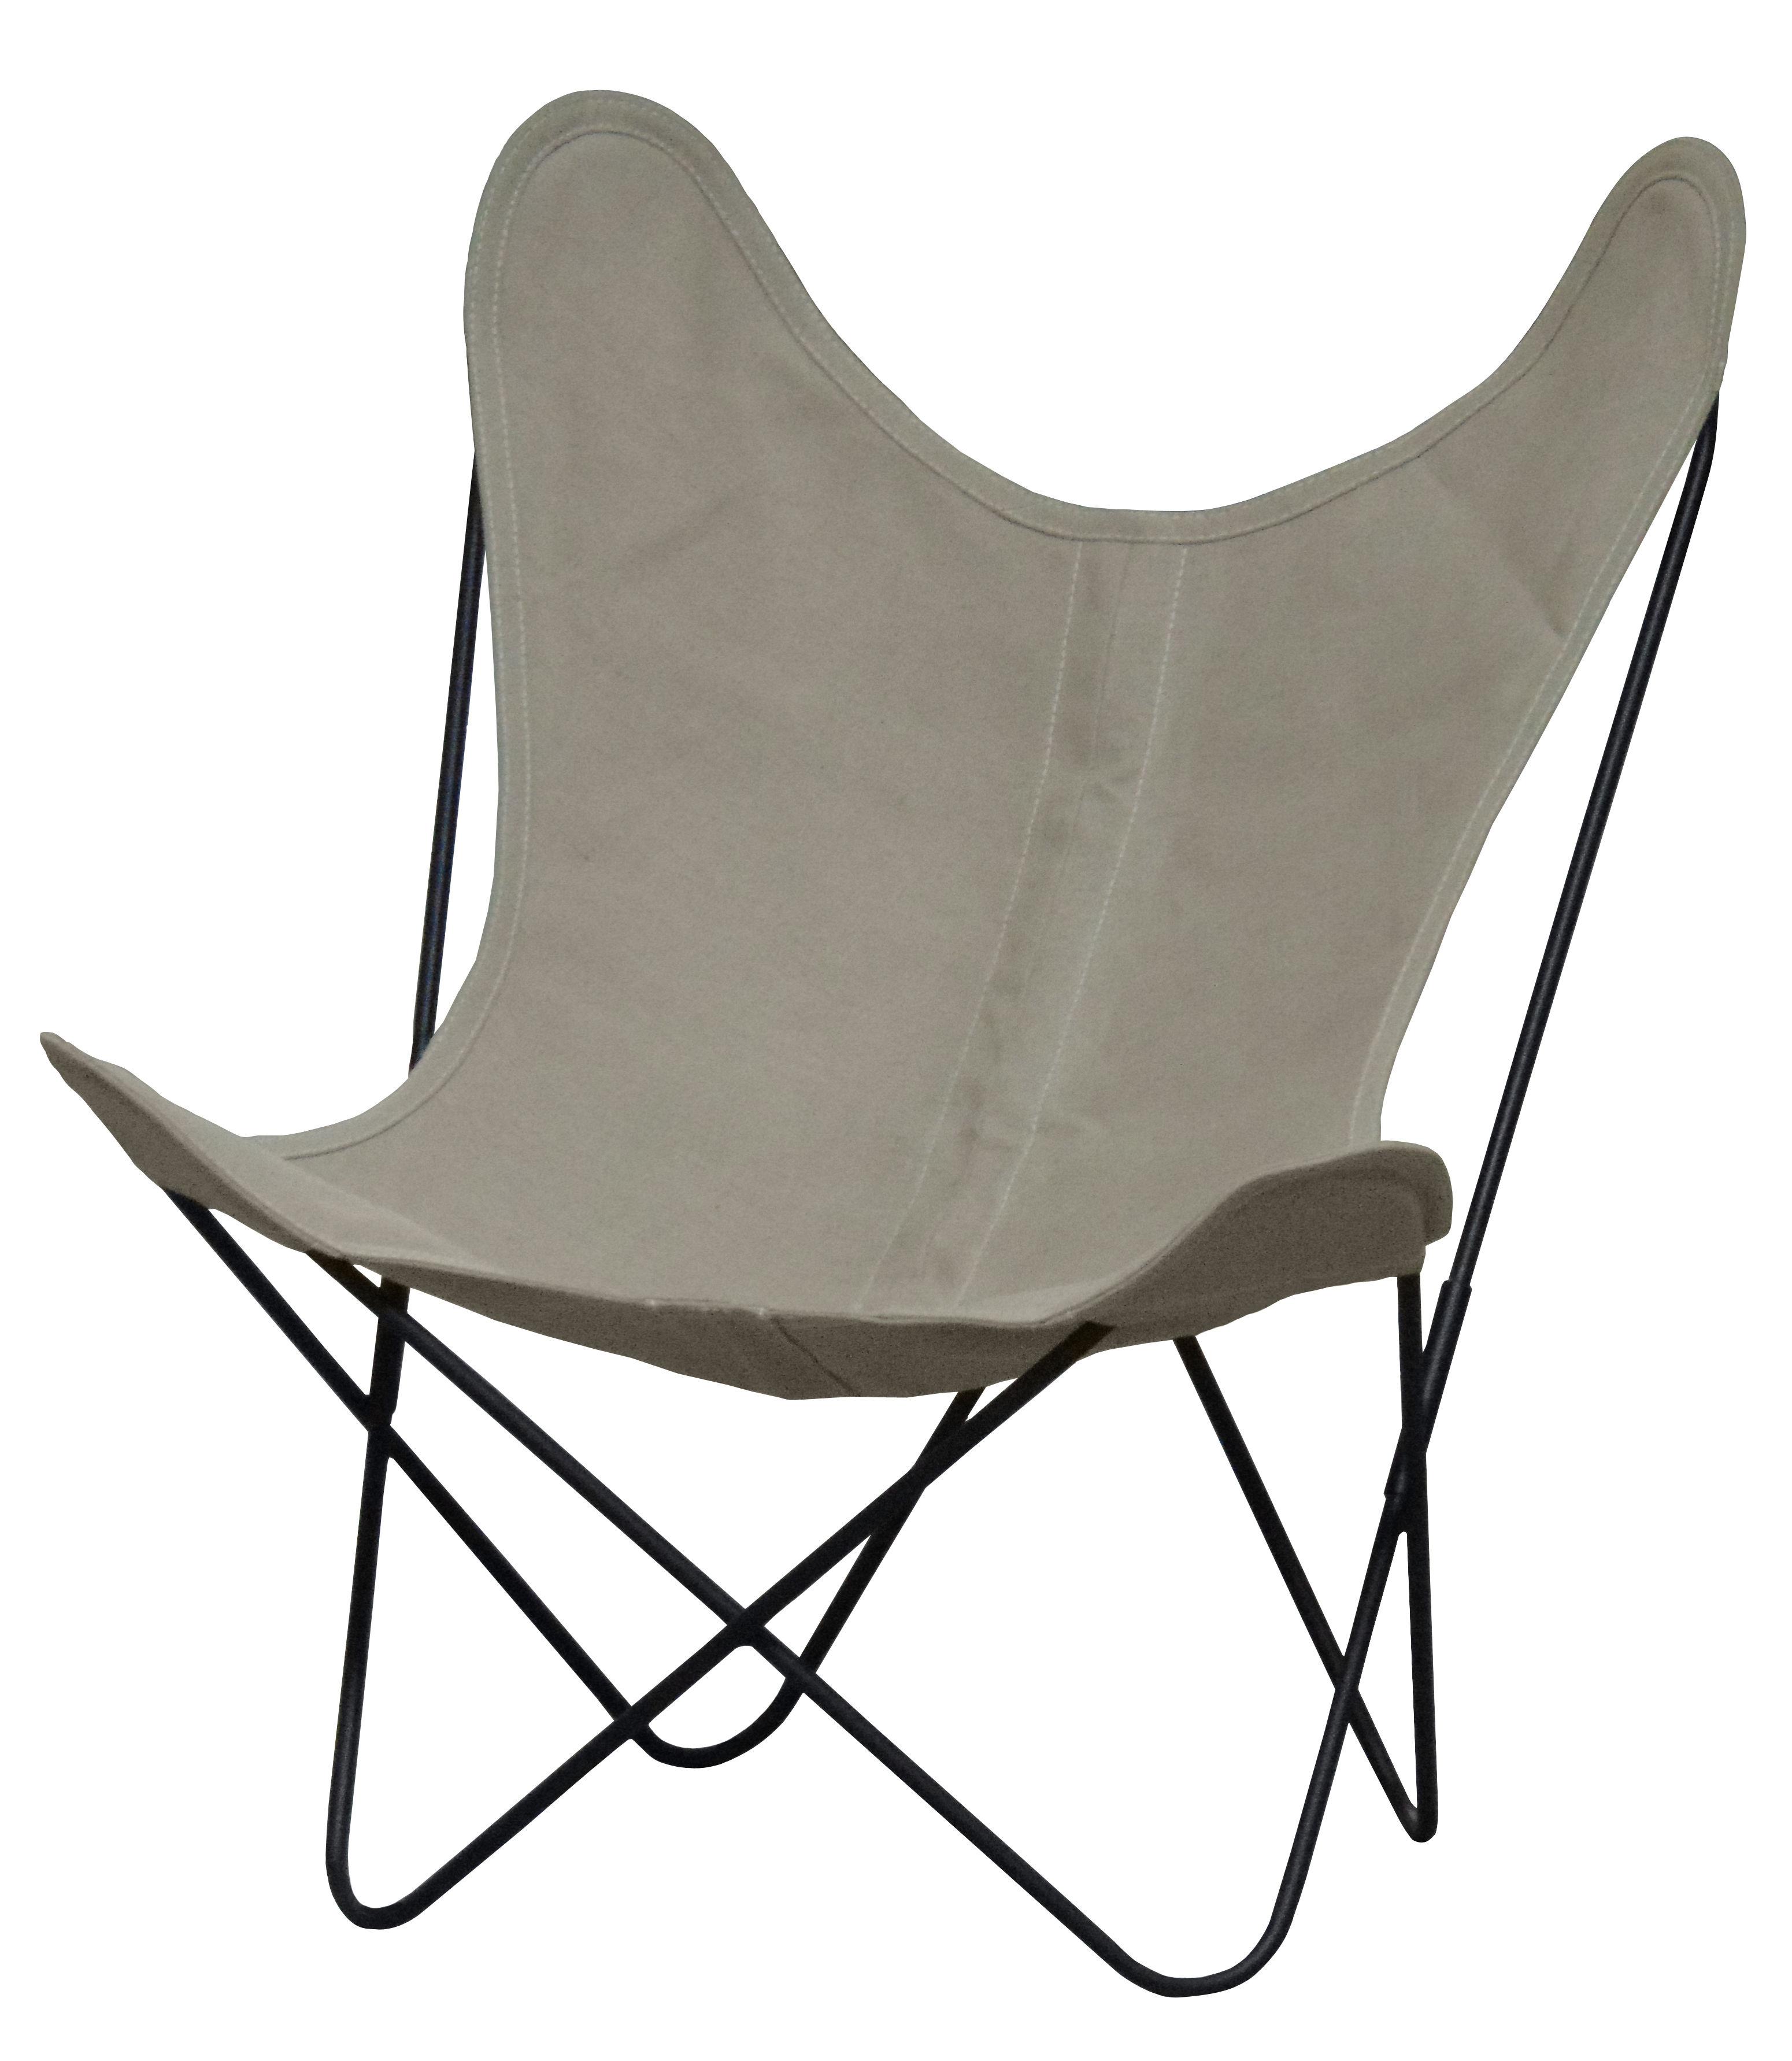 fauteuil bas aa butterfly lin ecru structure noire. Black Bedroom Furniture Sets. Home Design Ideas